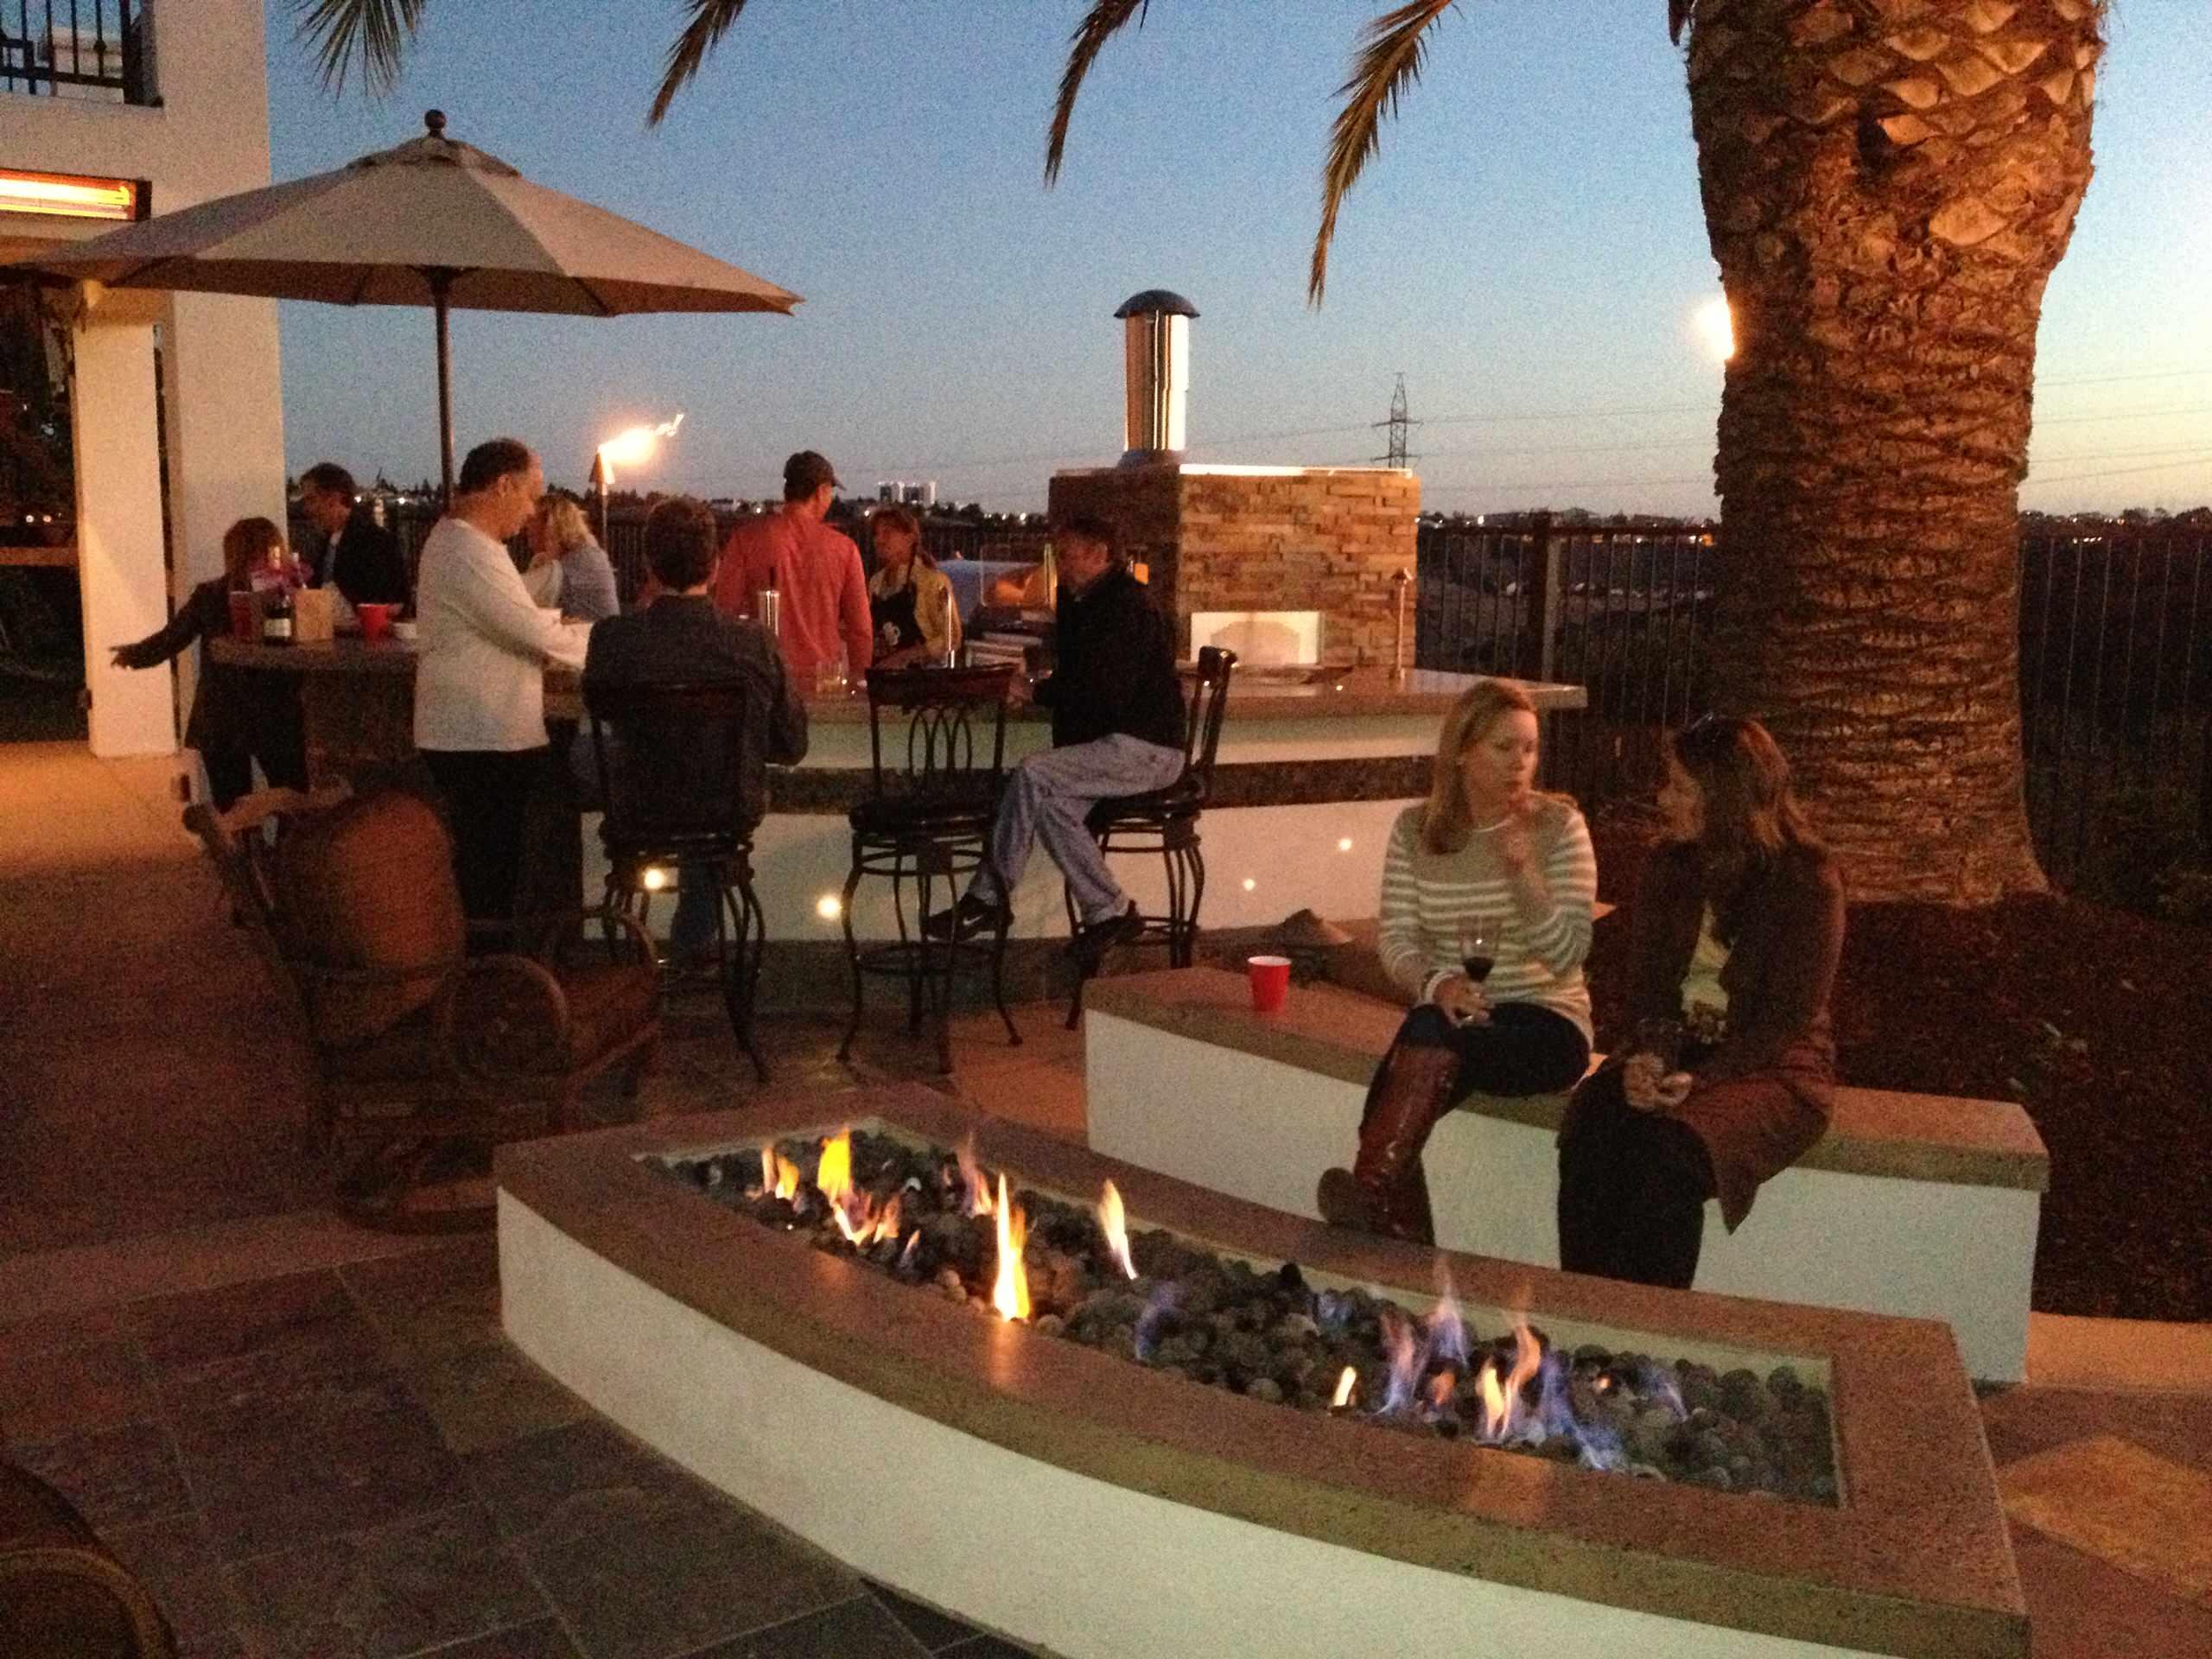 Carmel Valley Outdoor Kitchen & Fire Pit